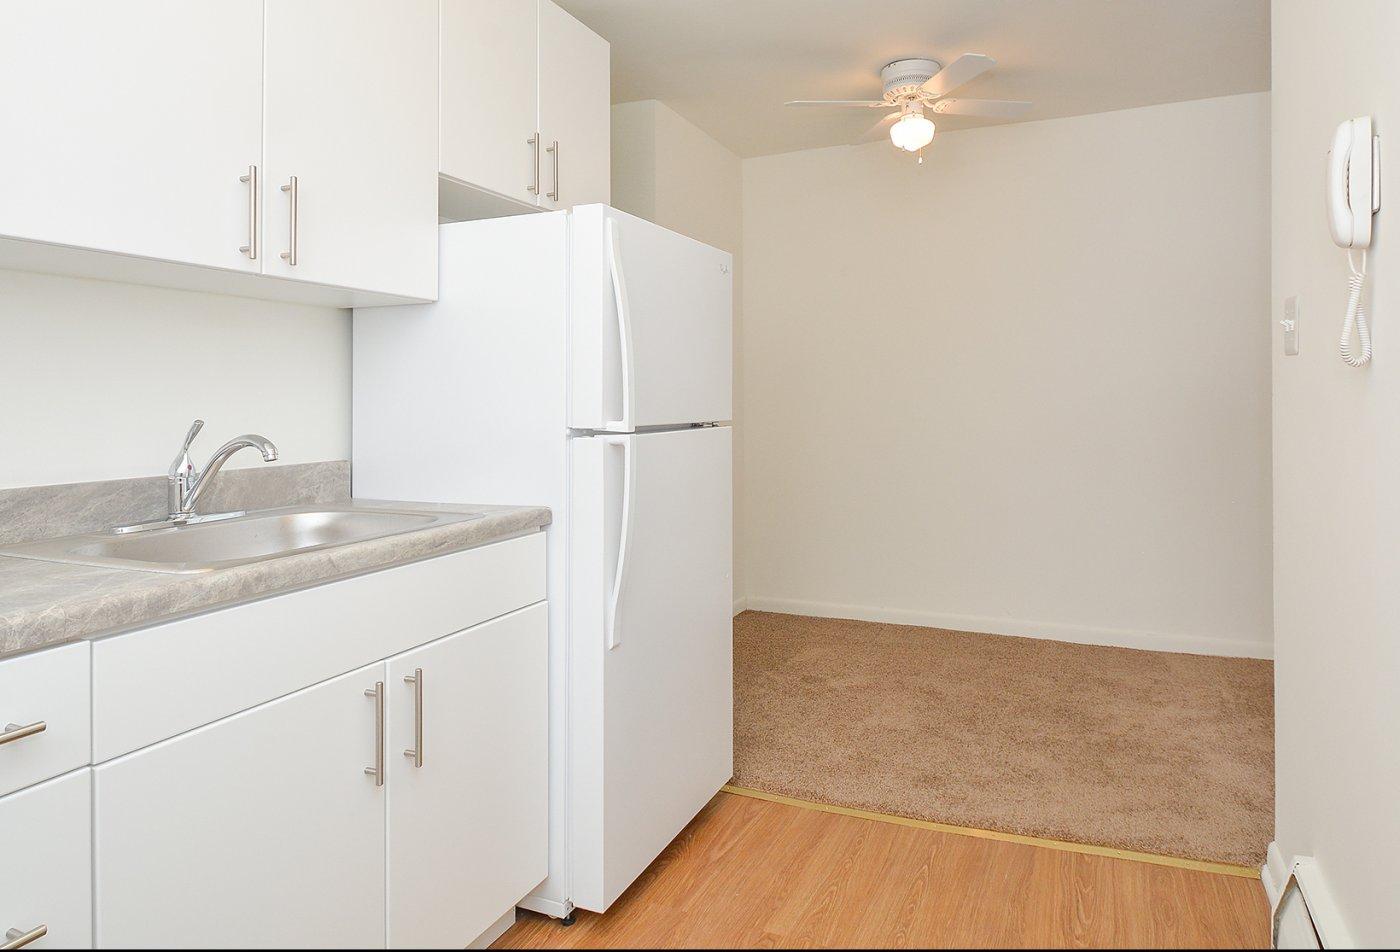 Elegant Kitchen | Apartments in Media, PA | Woodview Apartments